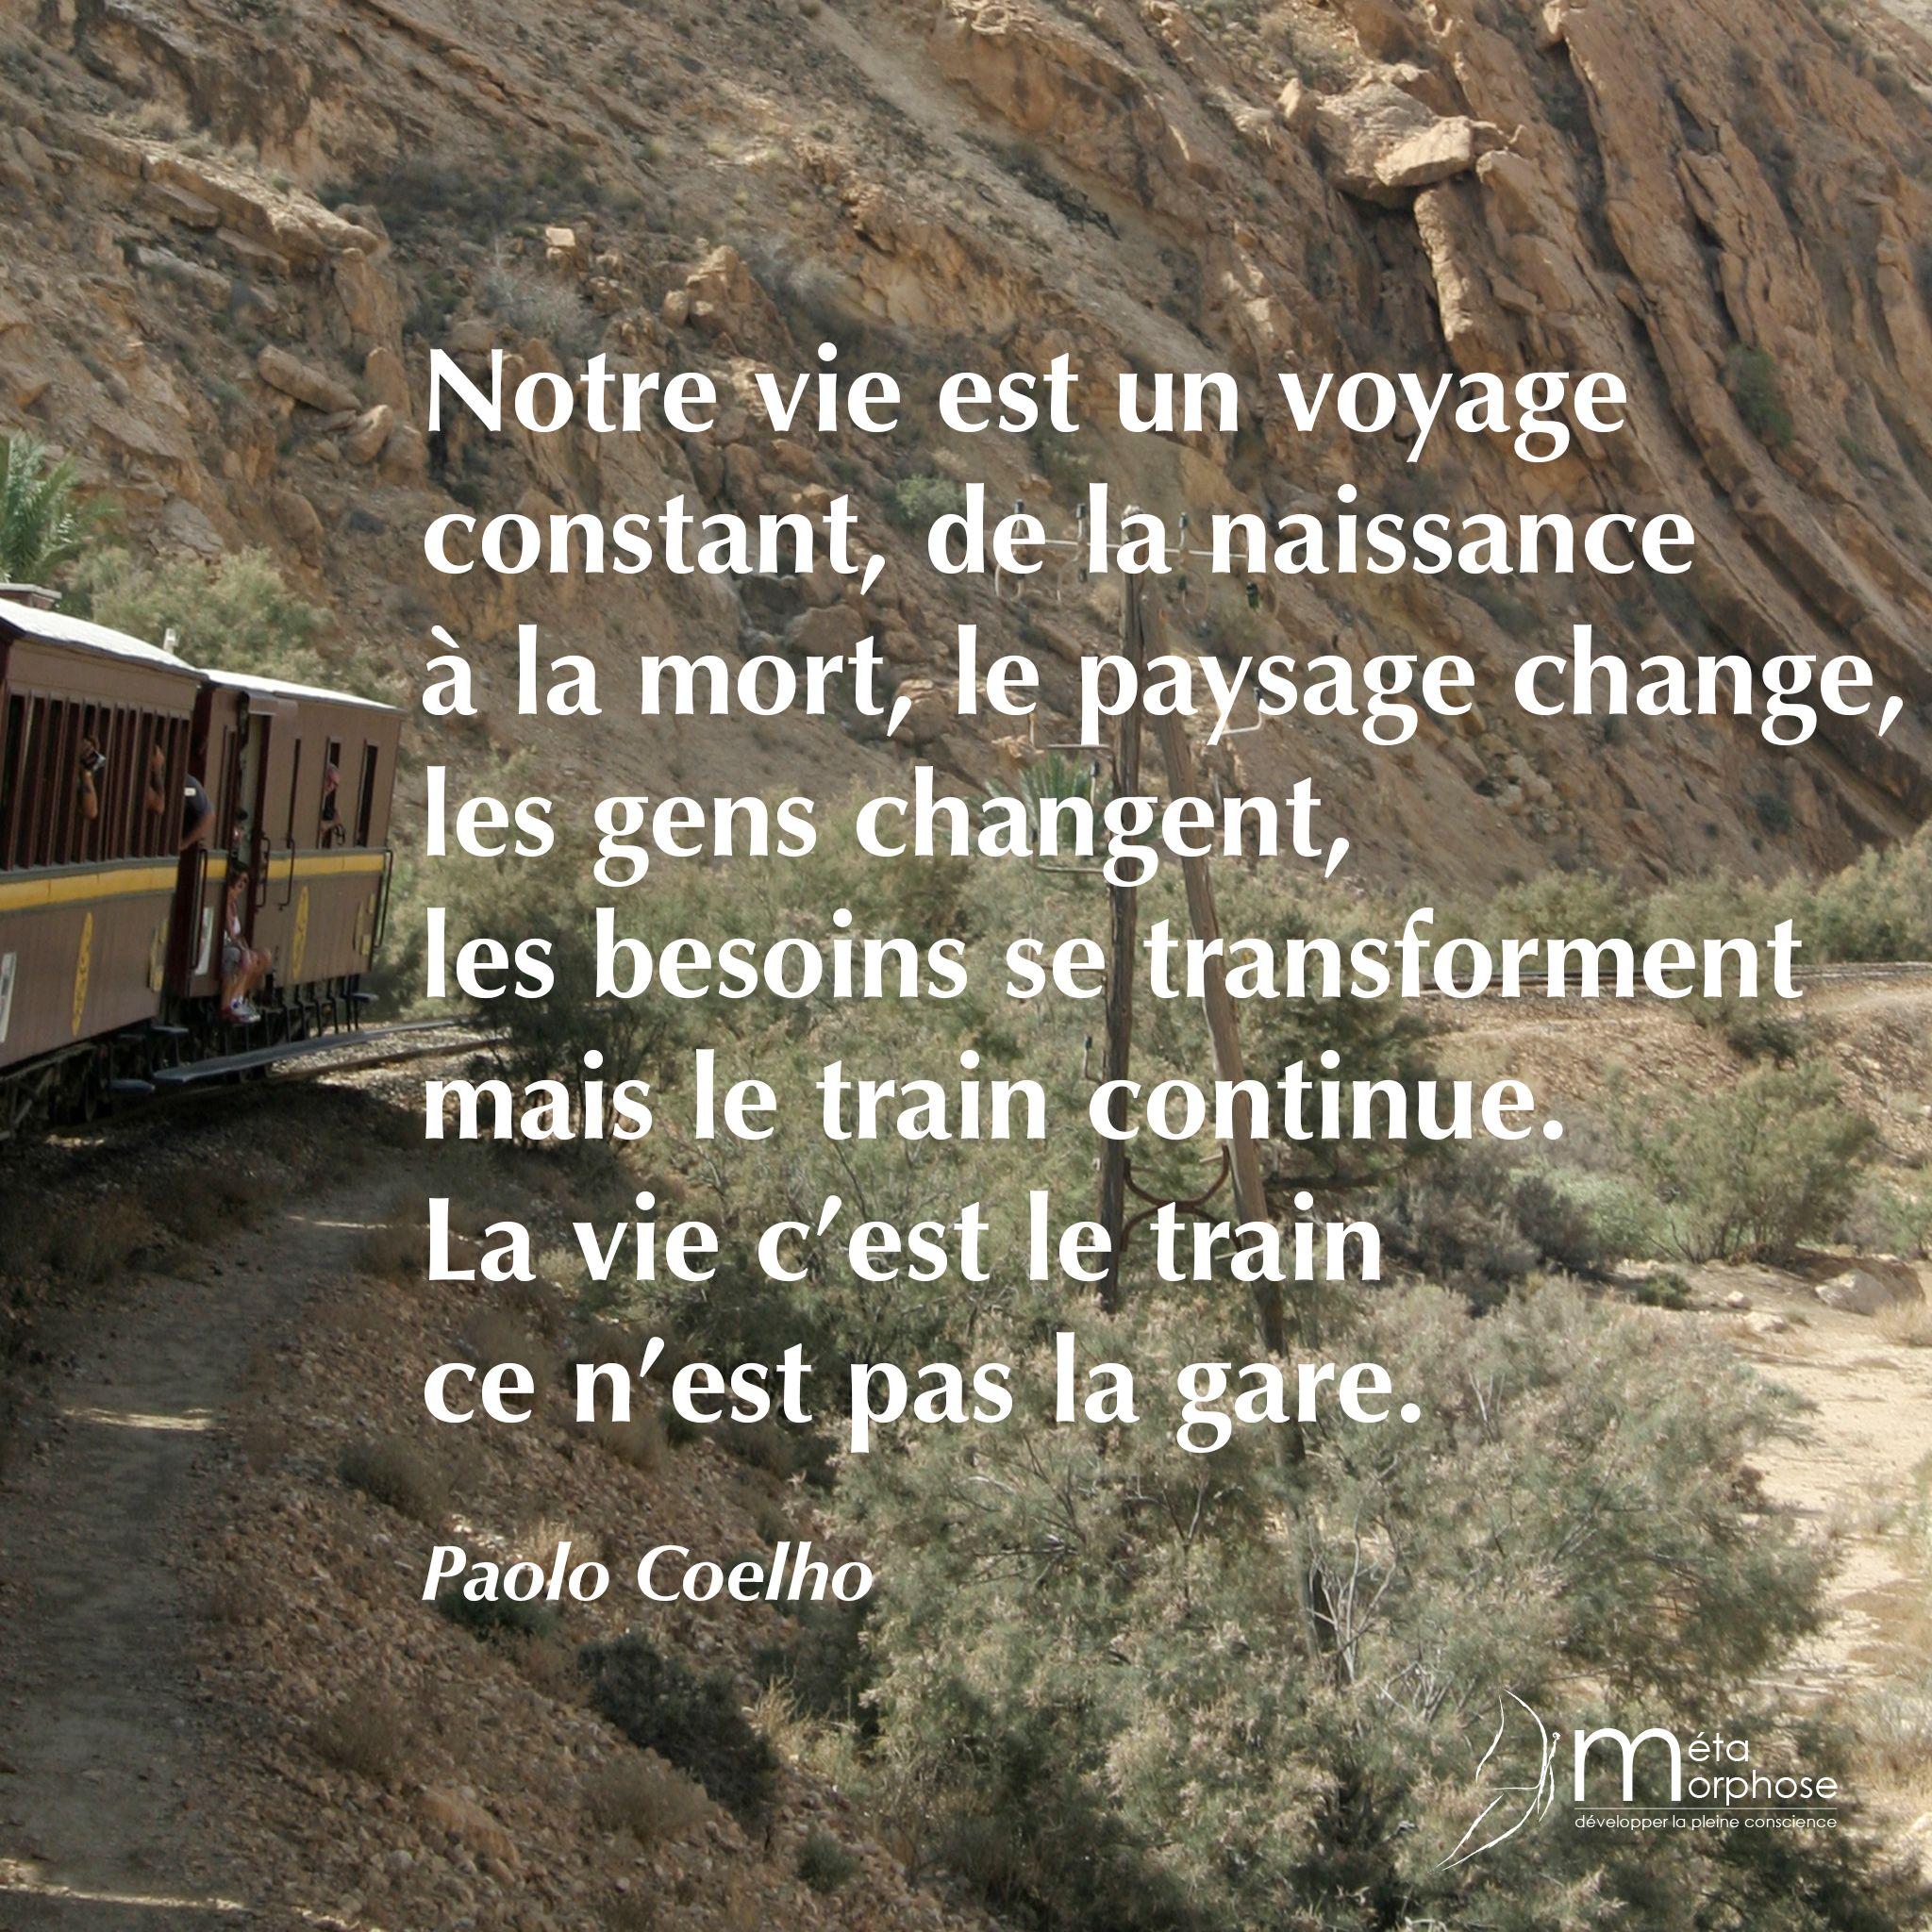 Le Voyage De La Vie 08h08 Jesuispresentamavie Voyage Vie Train Coelho Belles Citations Citation Proverbe Vie